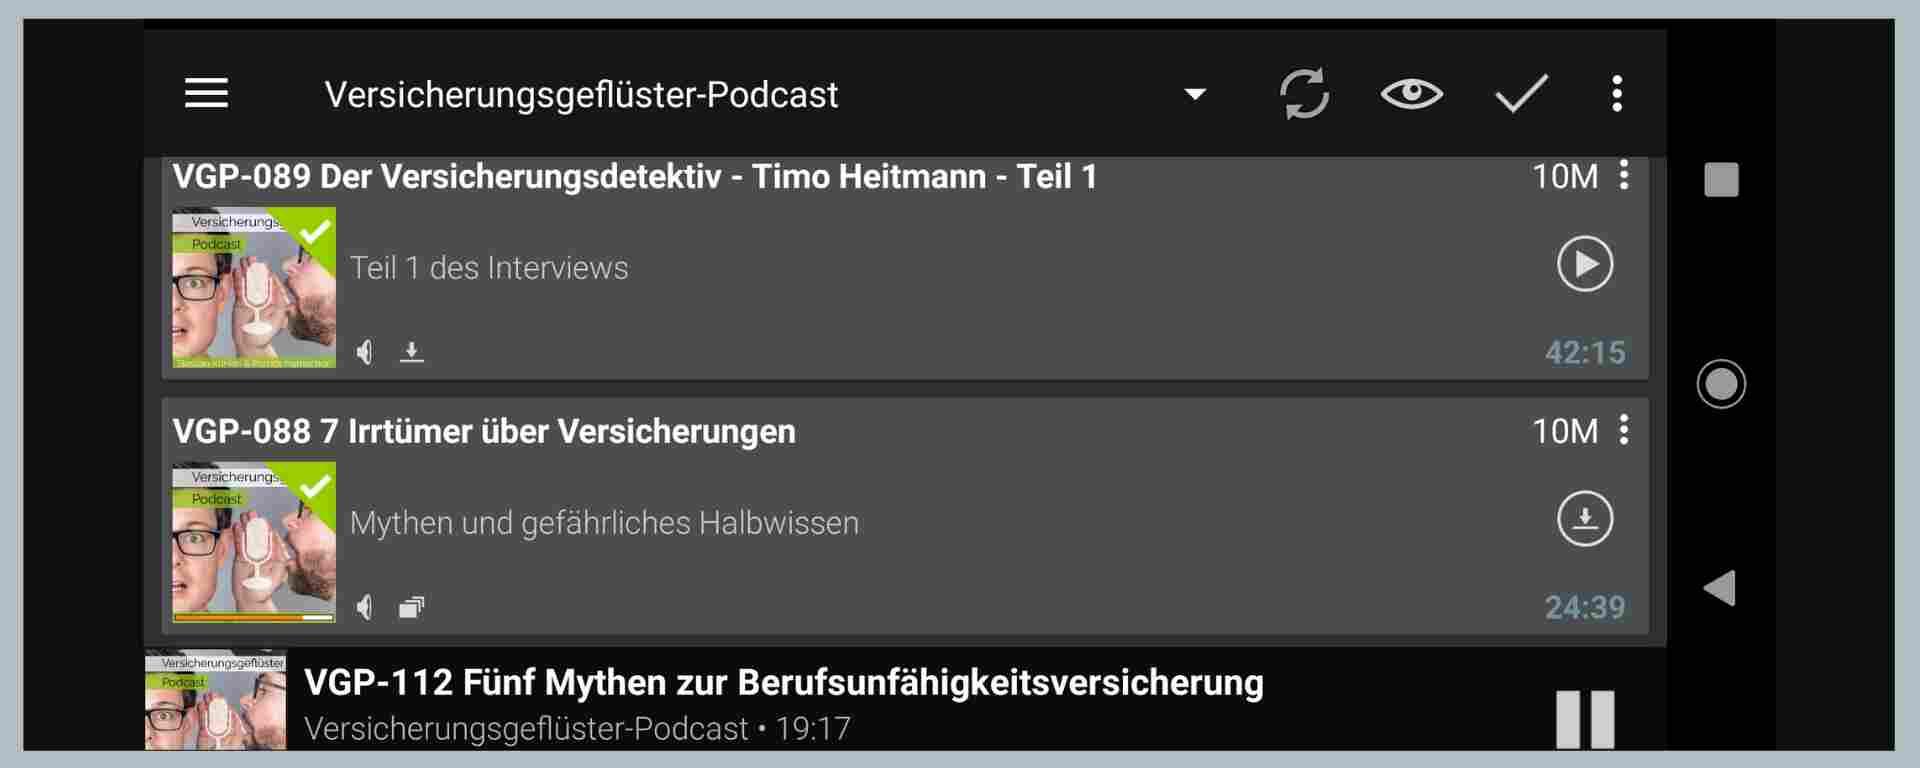 Versicherungsgeflüster-Podcast (Podcast-App-Ansicht)